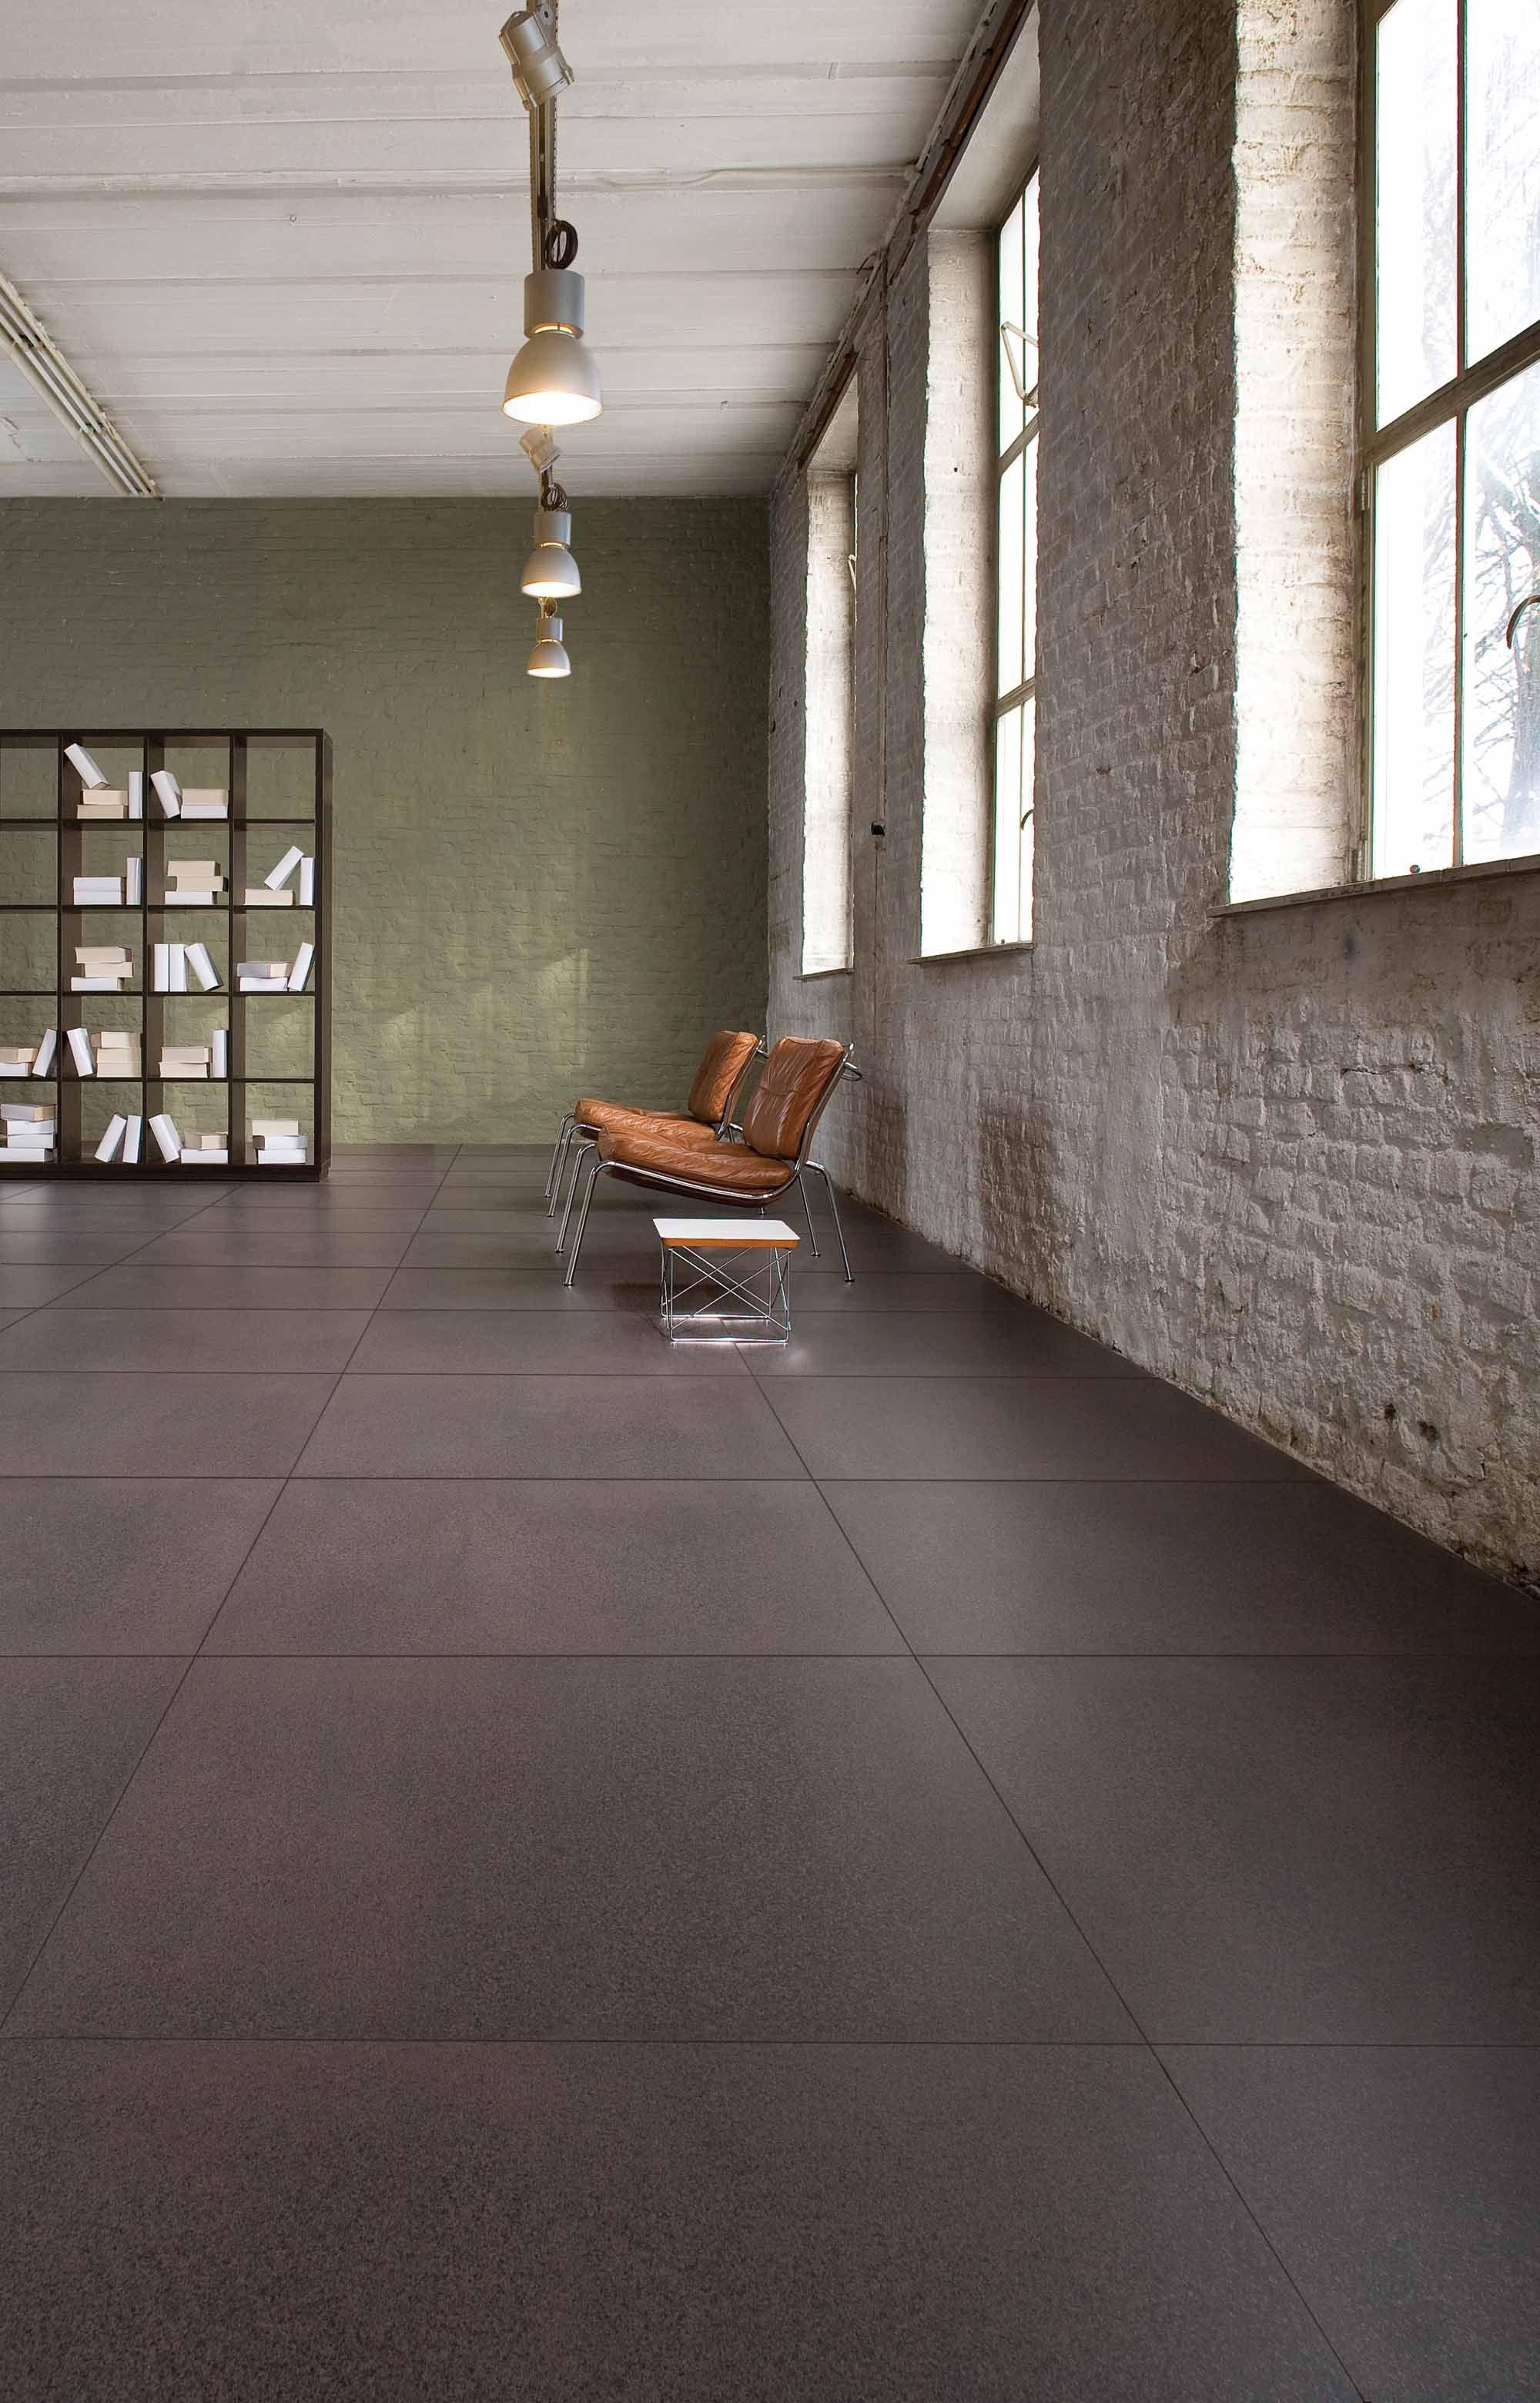 Quartz collection mosa tiles house quartz floor mosa ceramic quartz collection mosa tiles house quartz floor dailygadgetfo Images